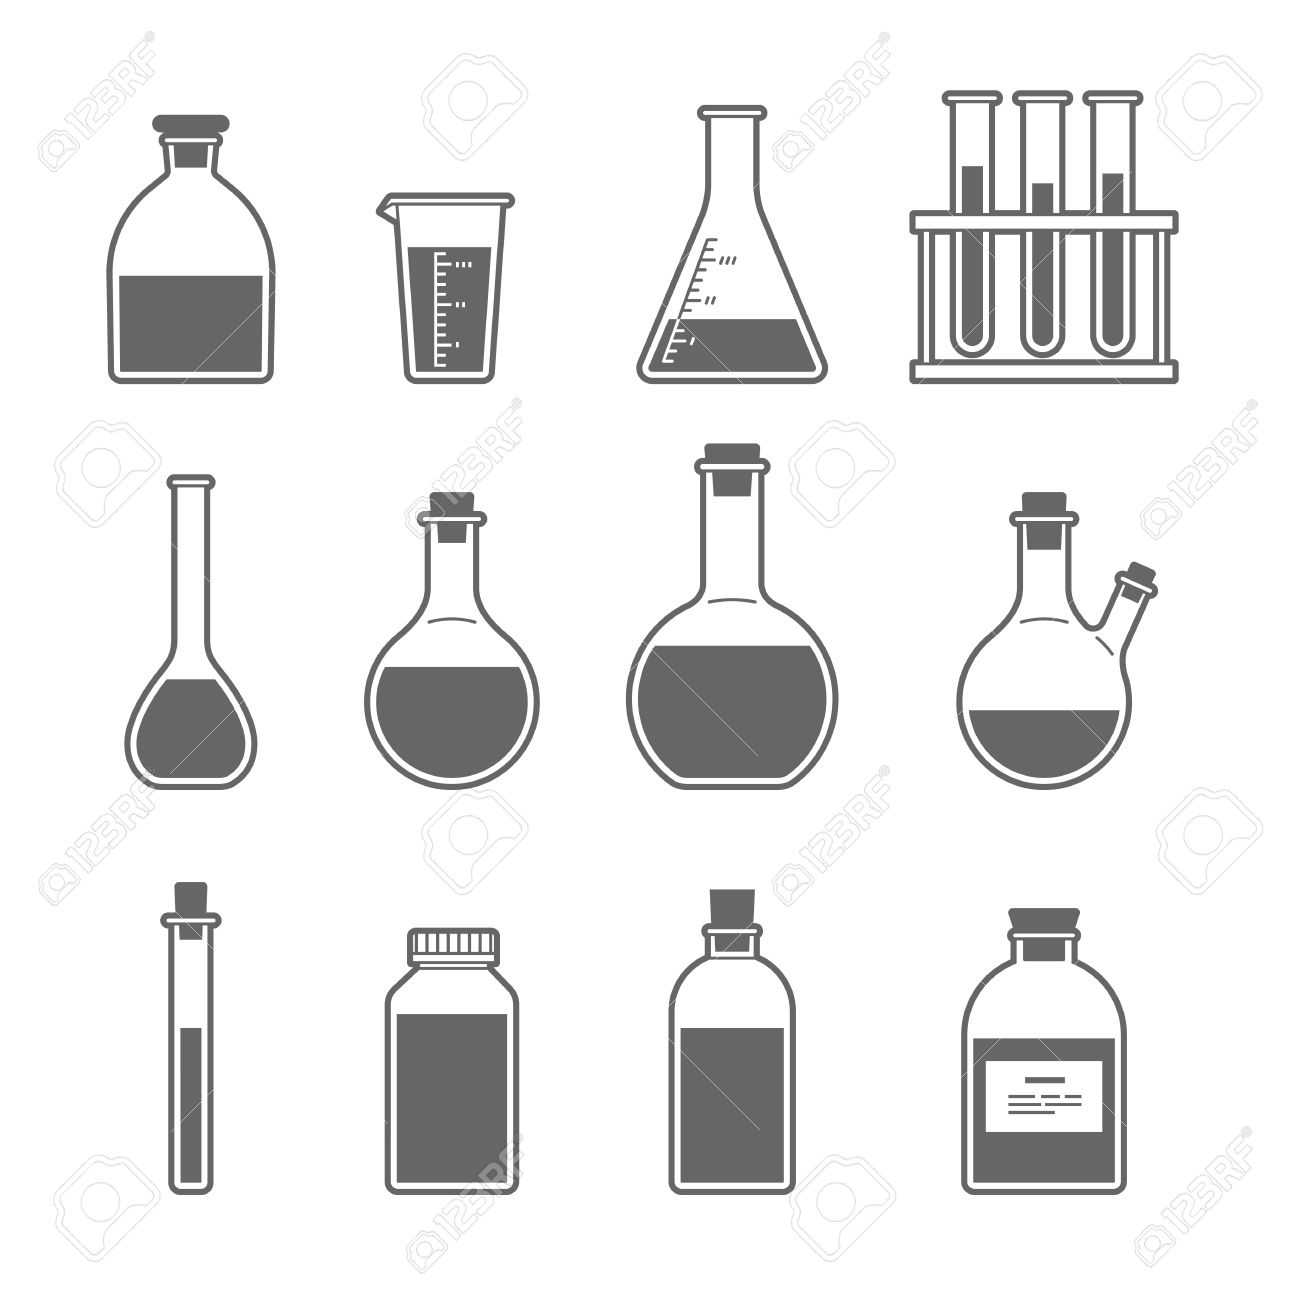 set chemical flask. erlenmeyer flask, distilling flask, volumetric